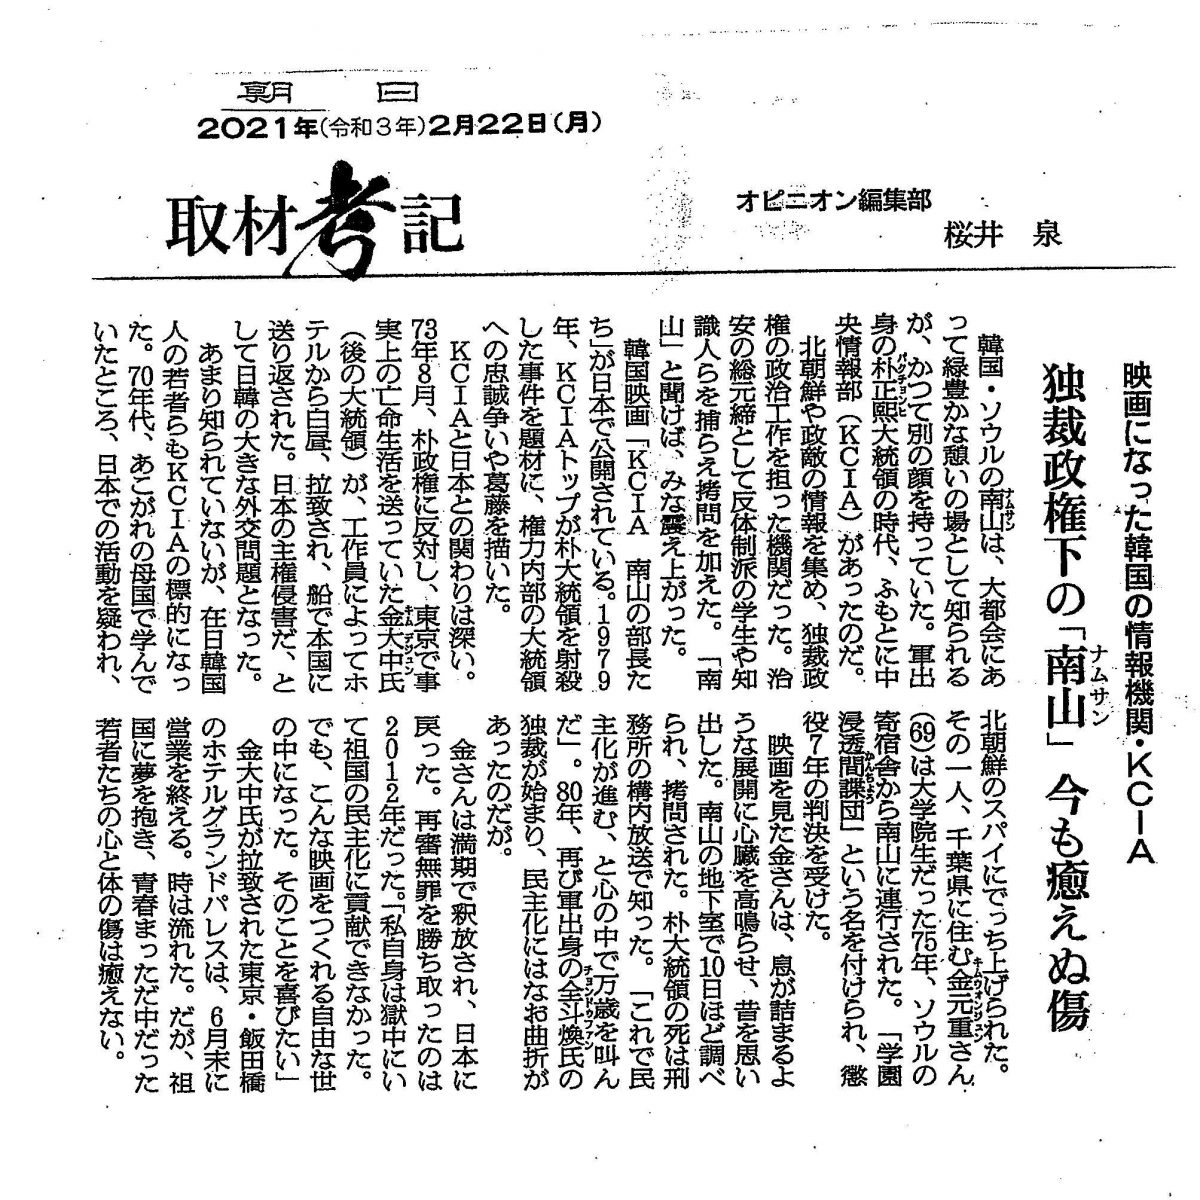 支援共闘会議・金元重顧問の闘い